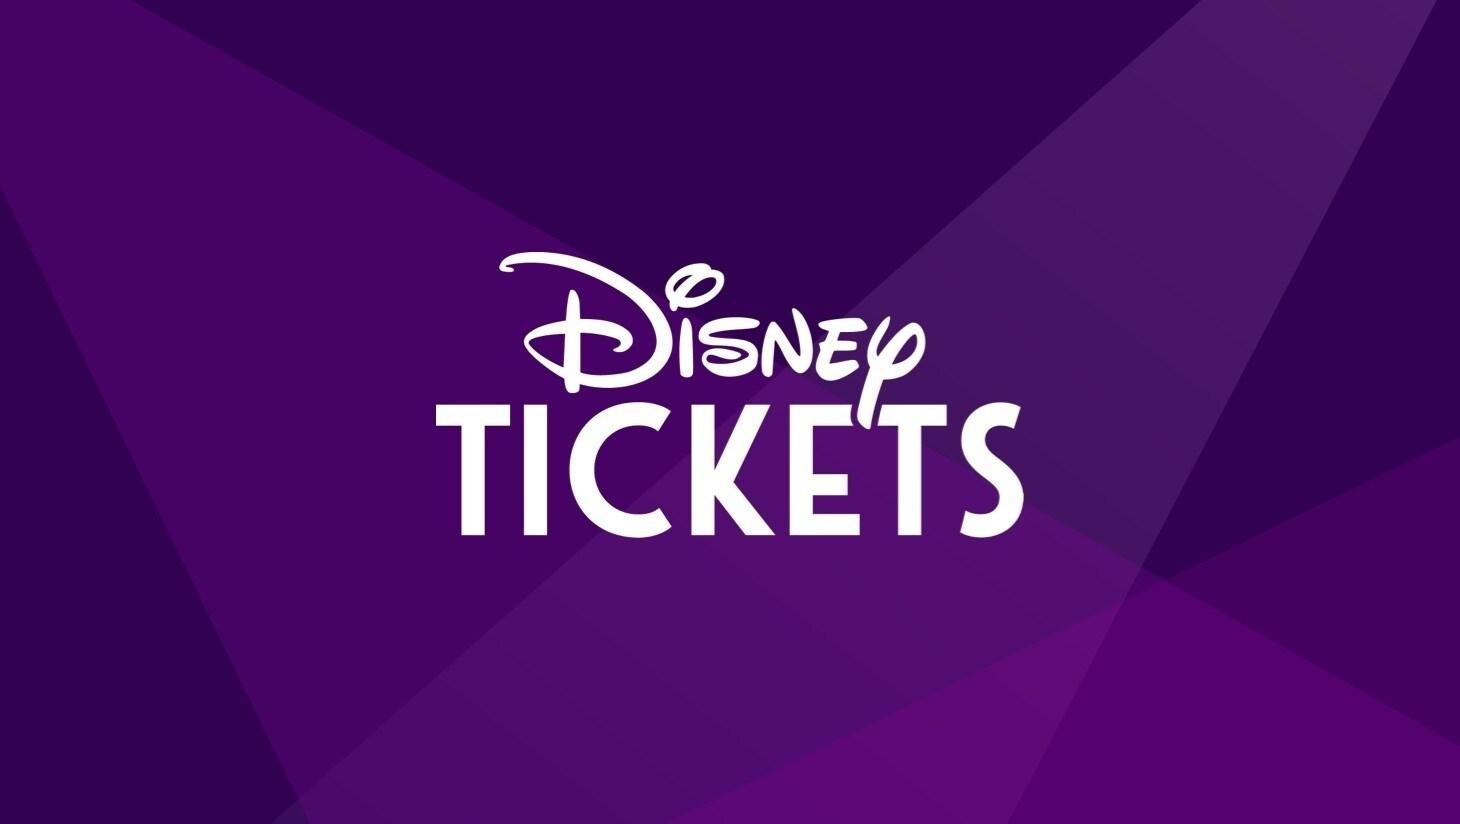 Disney Tickets logo